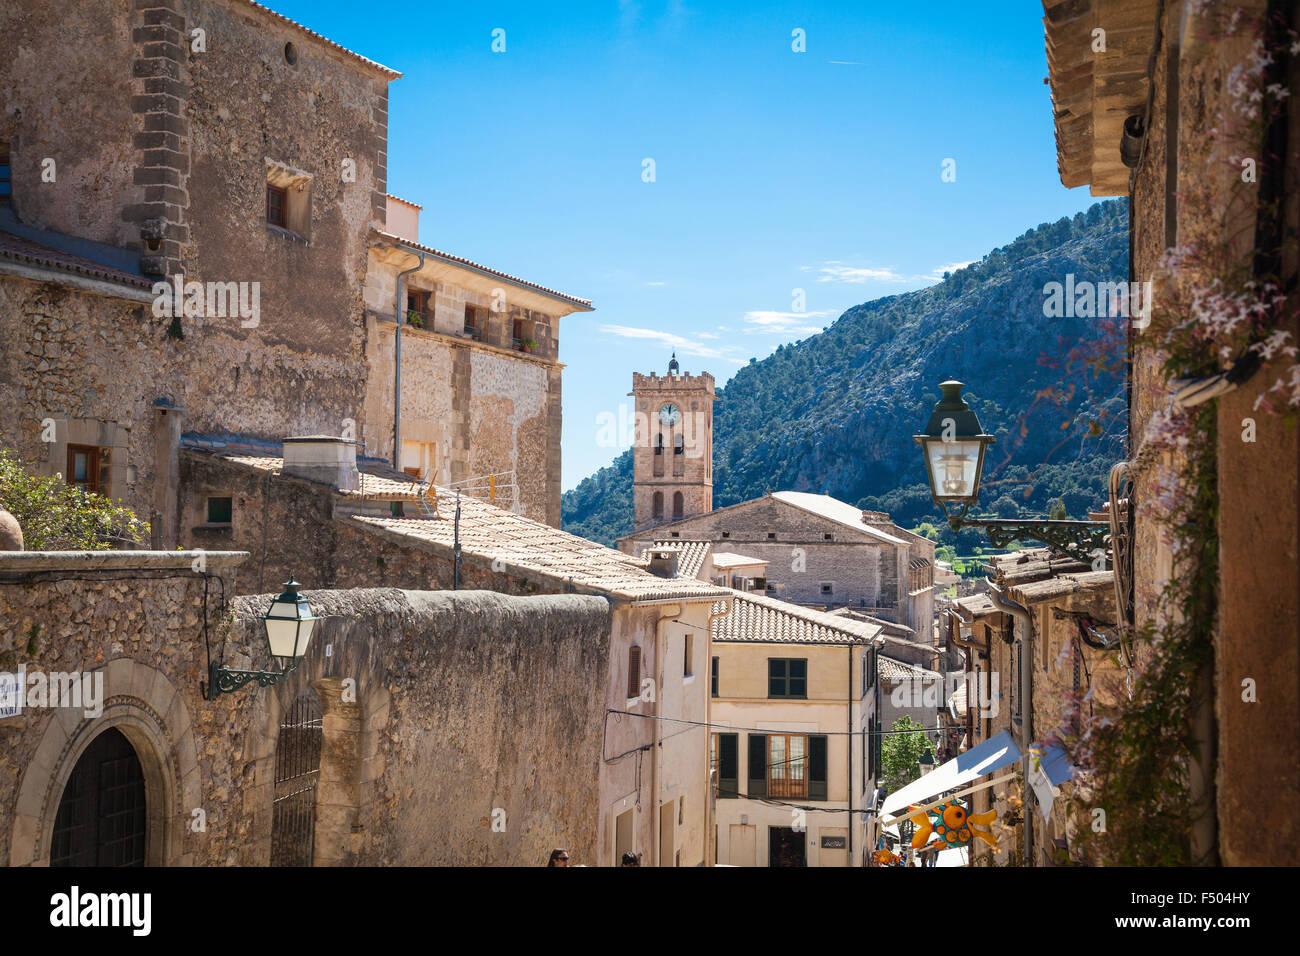 Pollenca, old village on the island of Mallorca - Stock Image